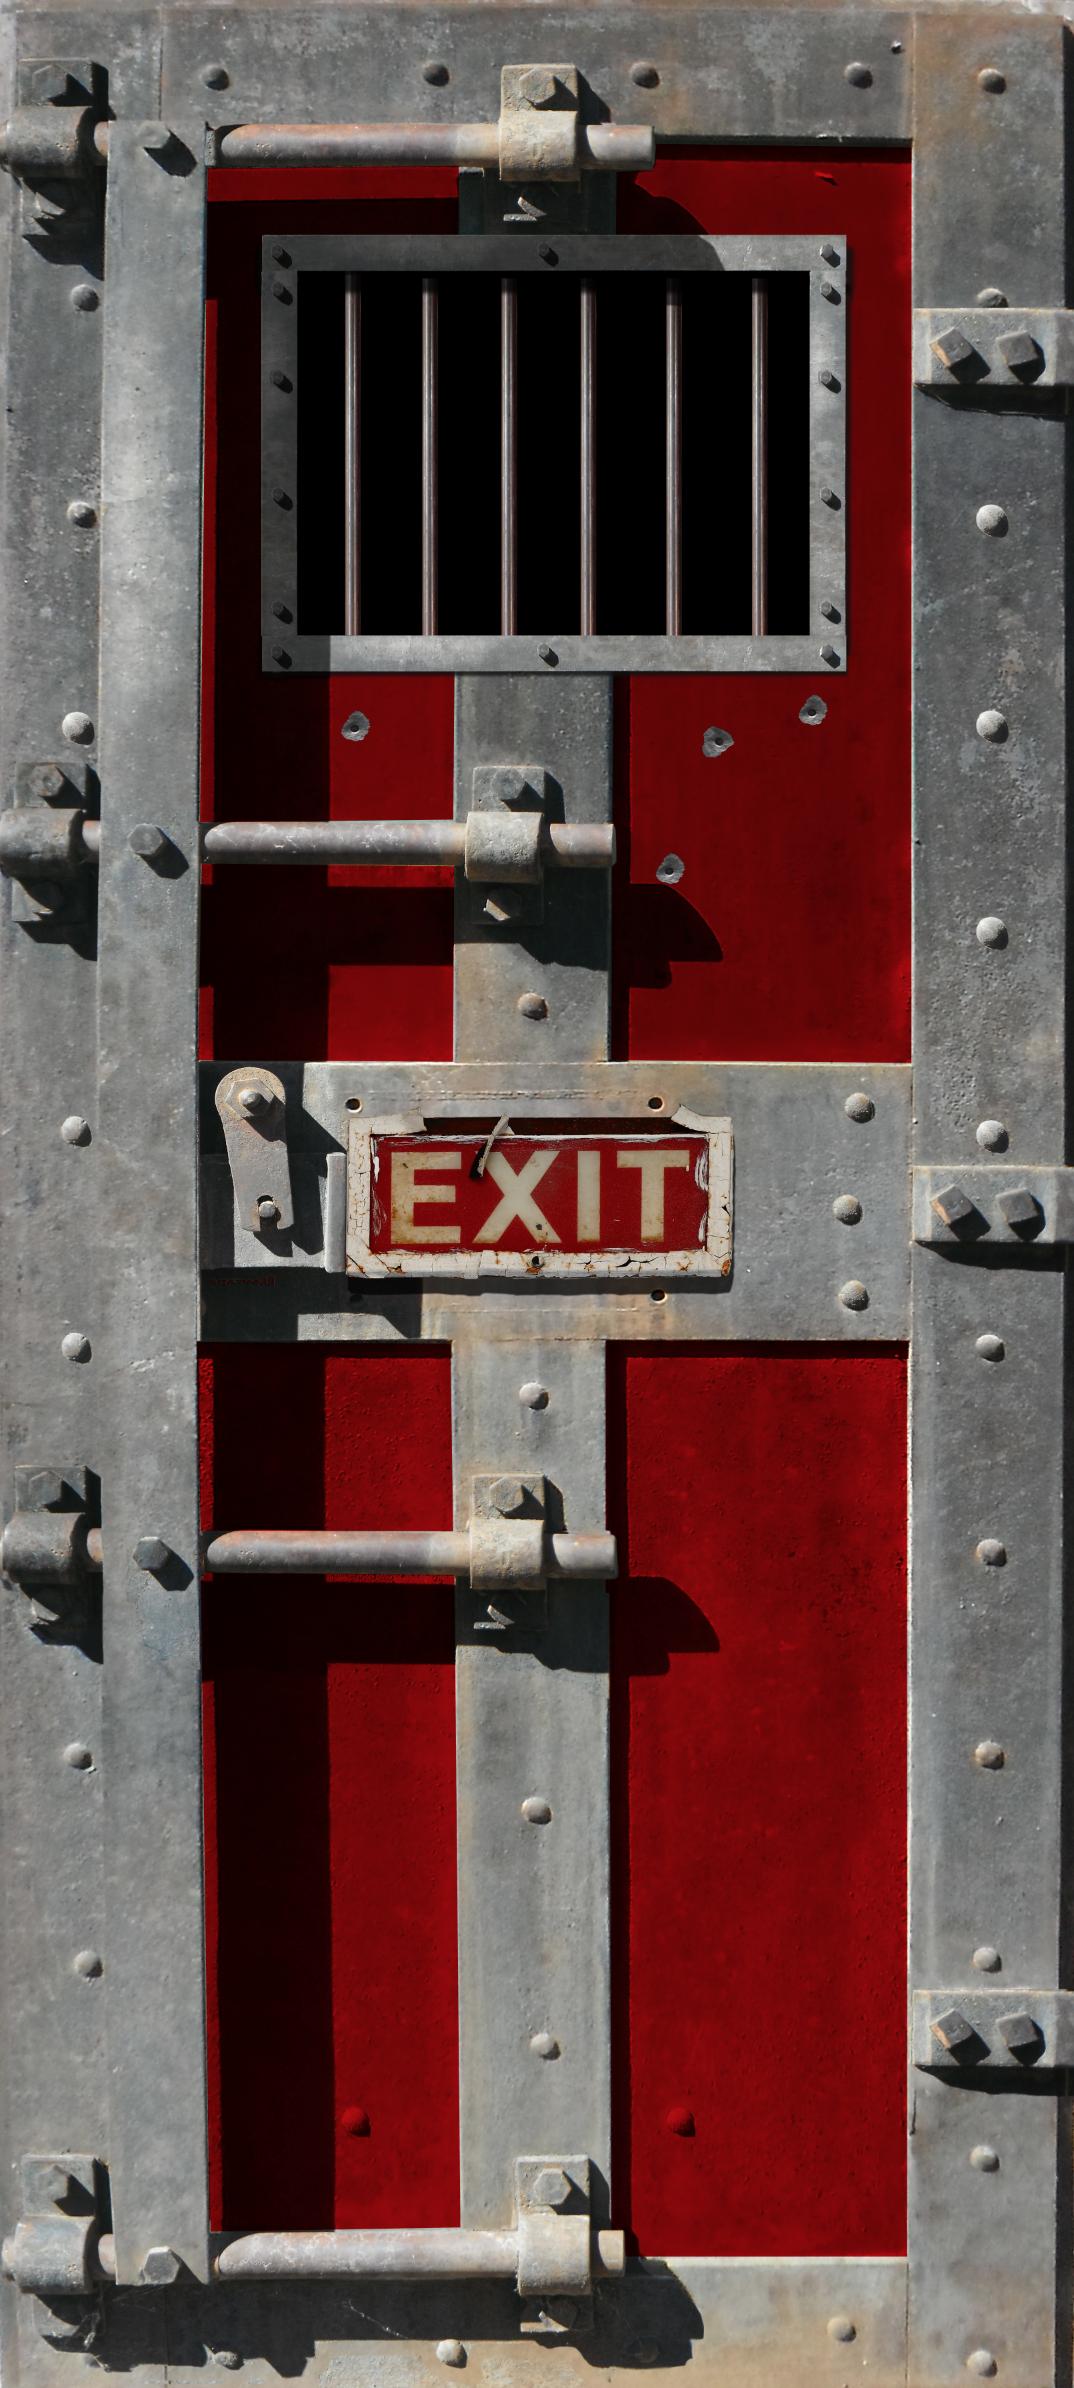 Jail Door Door Wrap & Jail Door Door Wrap u2014 Rm Wraps